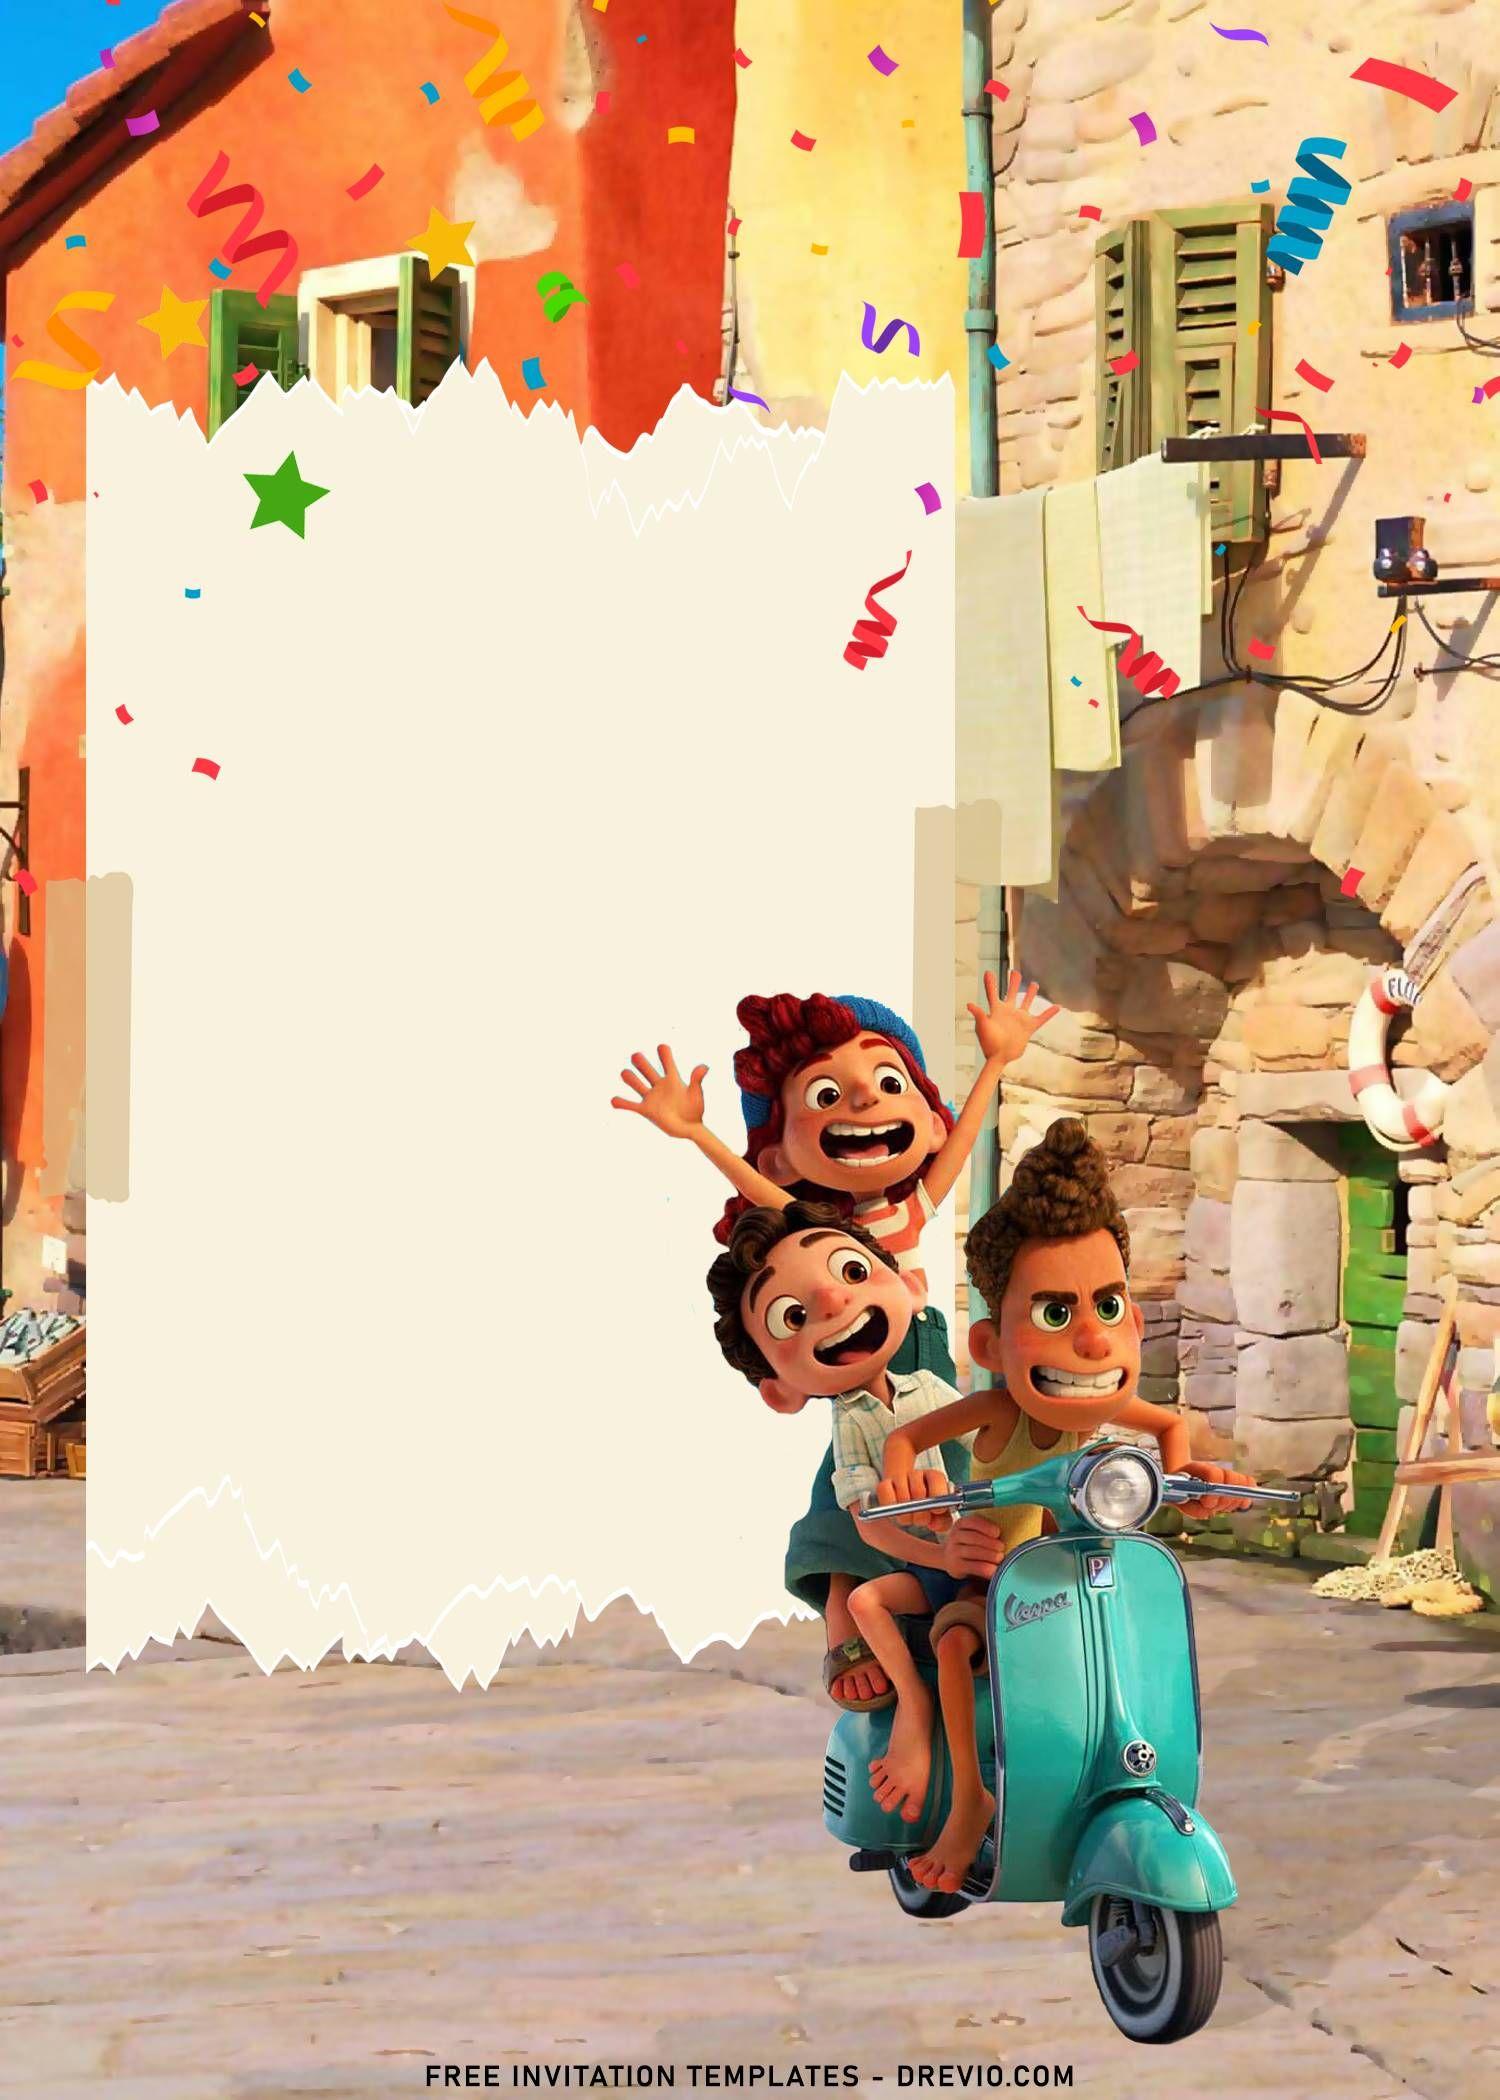 8 Disney Luca Birthday Invitation Templates For Your Kid S Birthday Party In 2021 Birthday Invitation Templates Birthday Invitations Free Printable Birthday Invitations